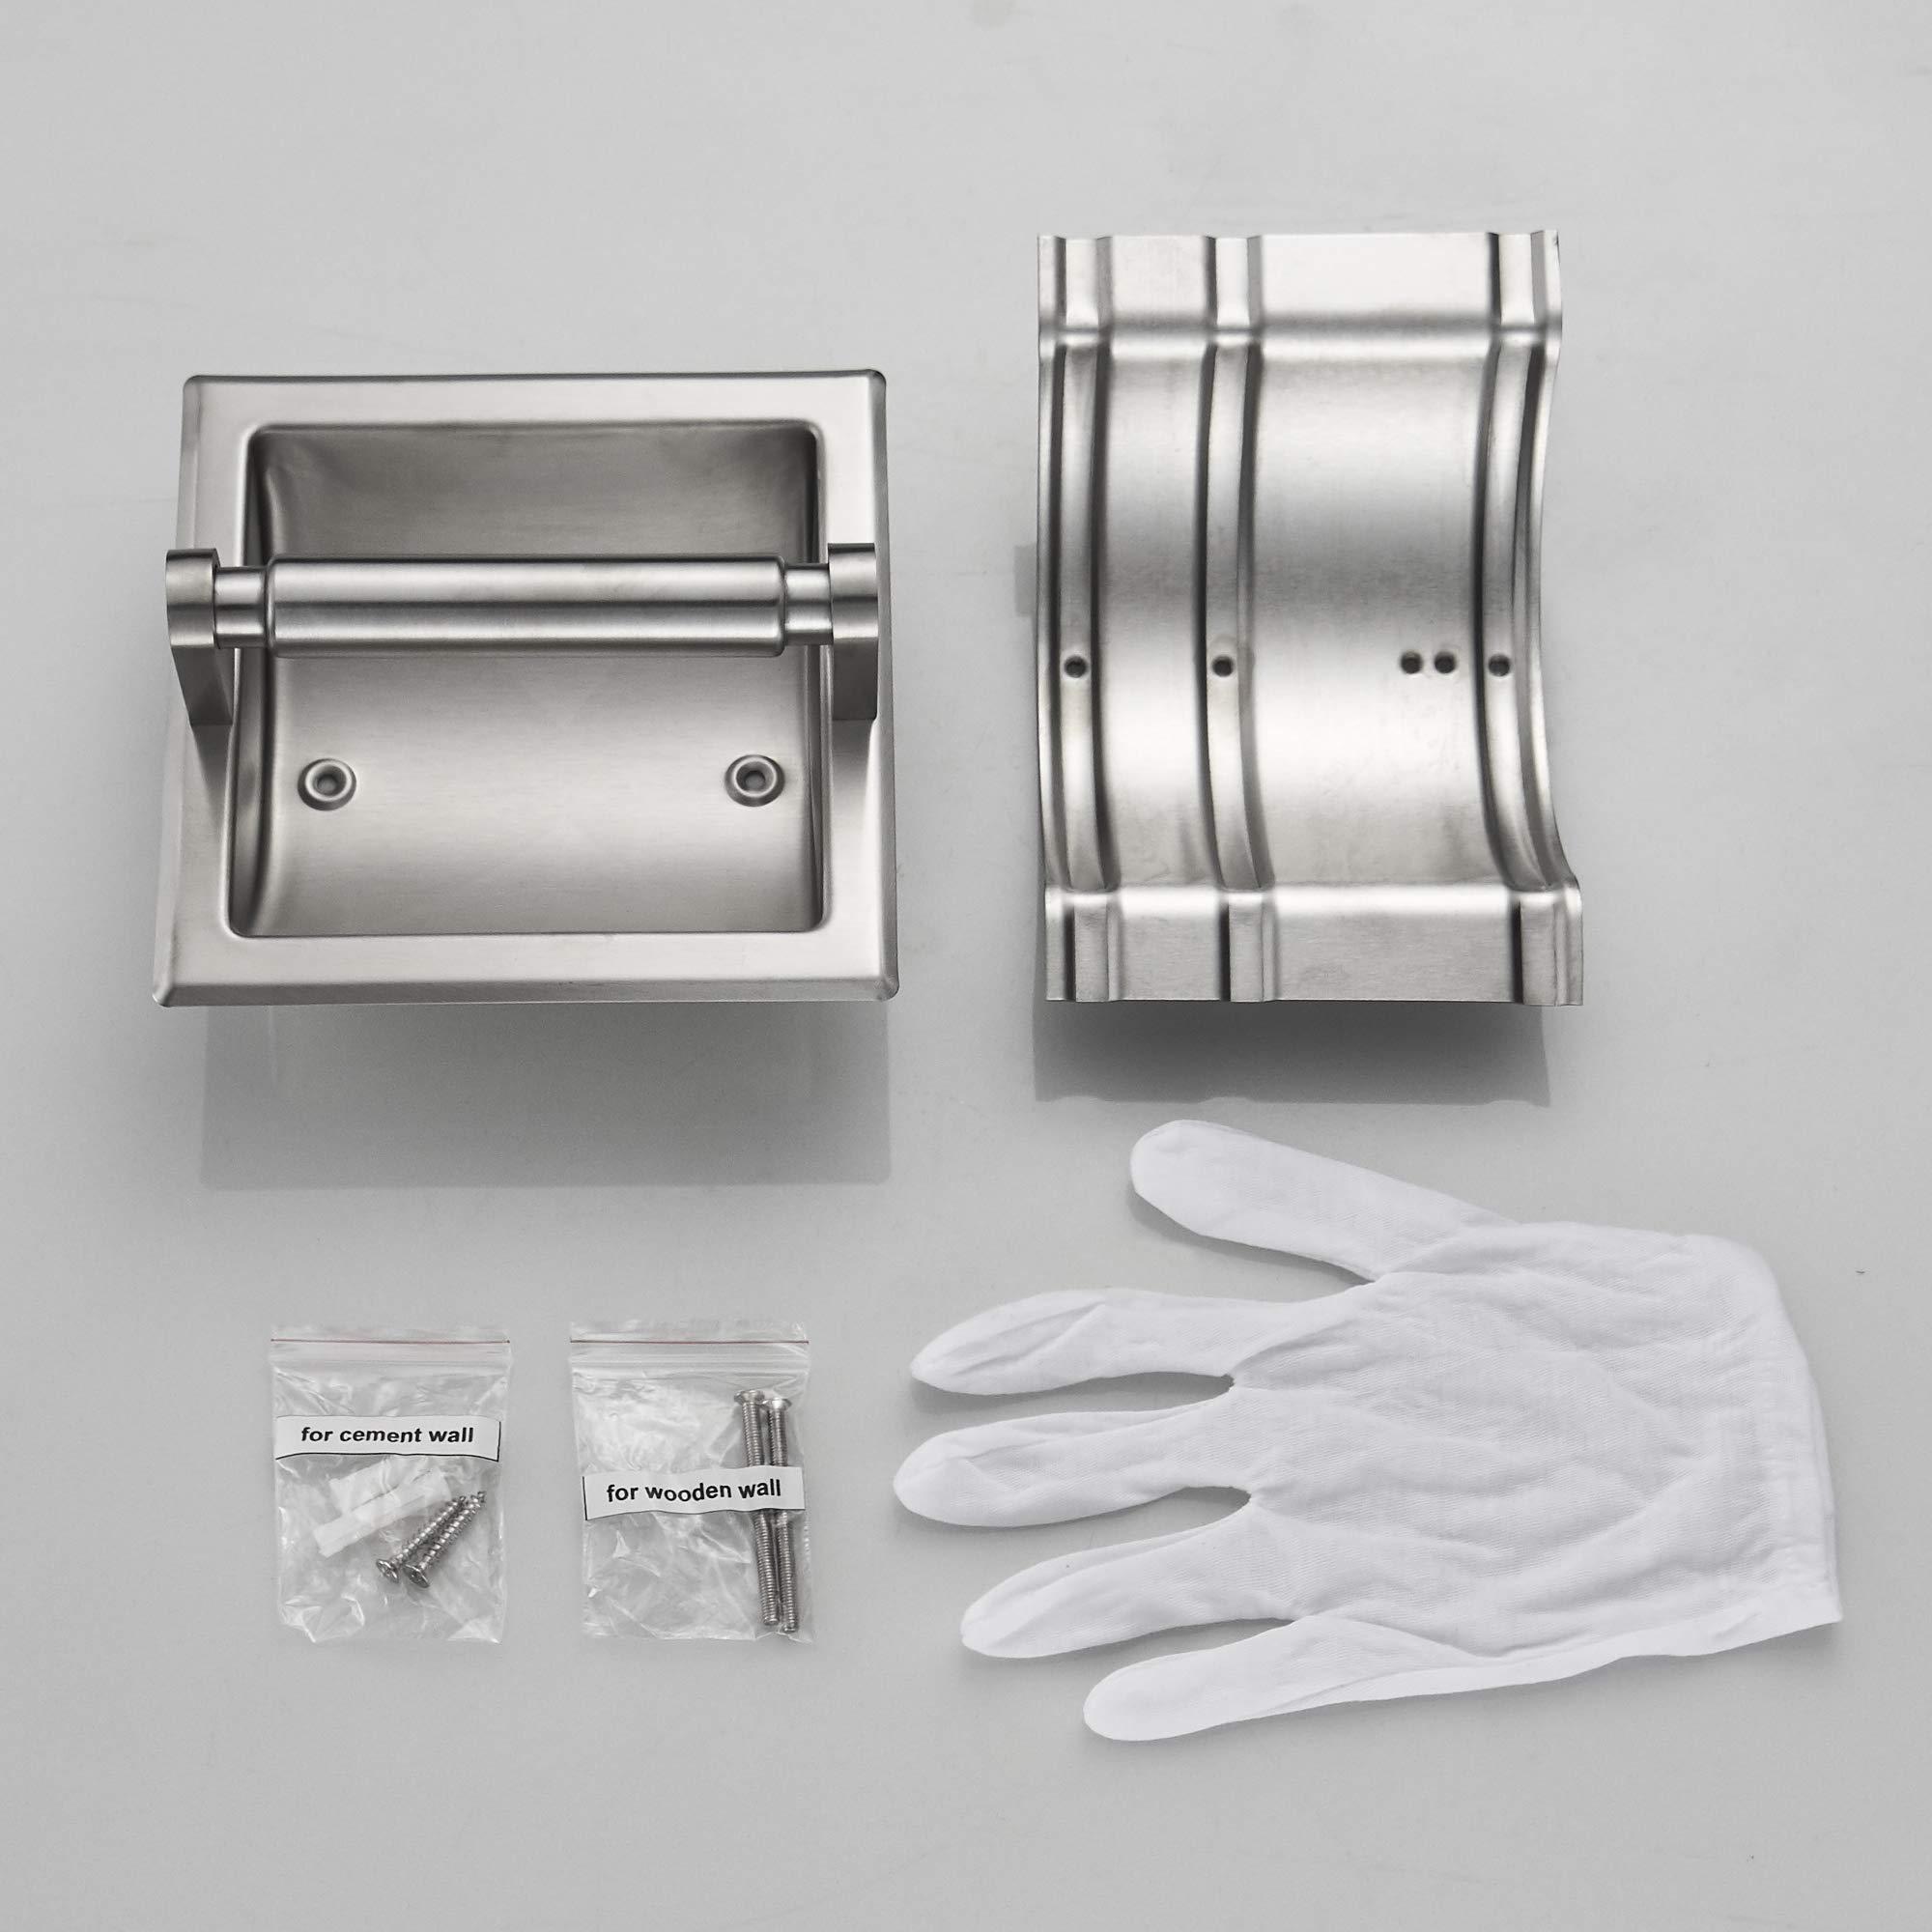 JunSun Brushed Nickel Recessed Toilet Paper Holder Wall Toilet Paper Holder Recessed Toilet Tissue Holder Stainless Steel Toilet Paper Holder Rear Mounting Bracket Included by JunSun (Image #9)